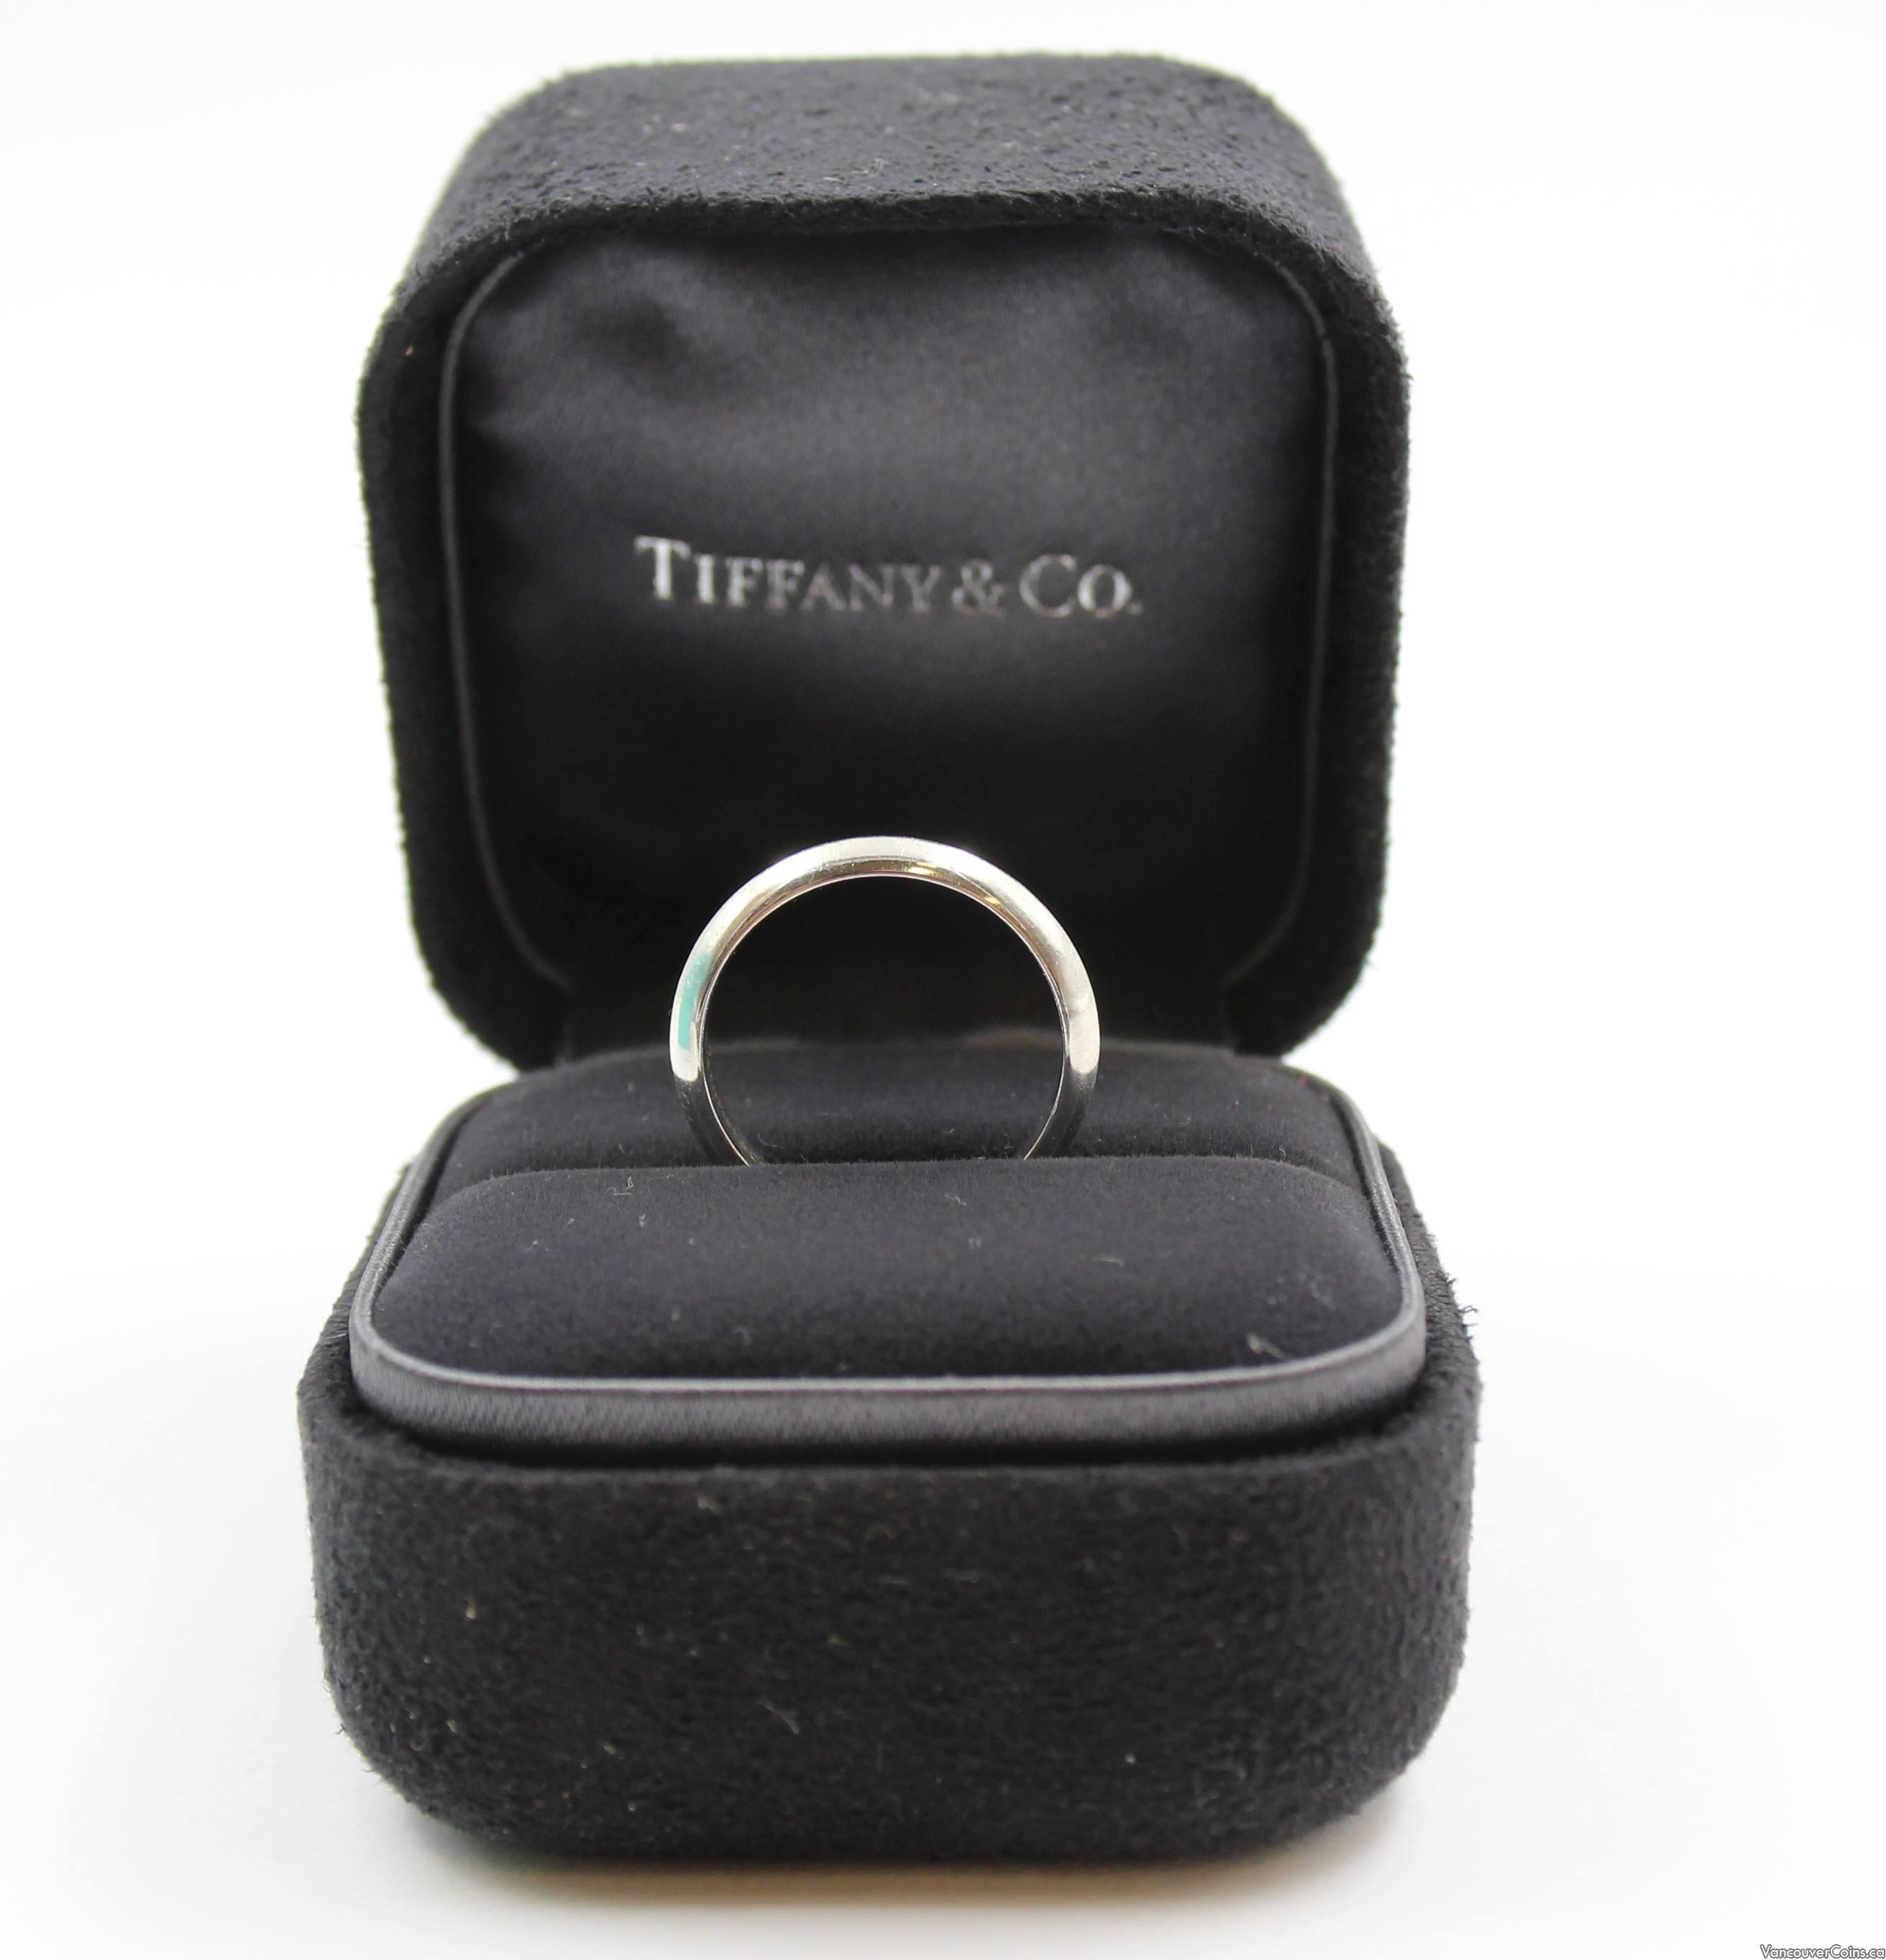 Tiffany & Co PT950 platinum ring band